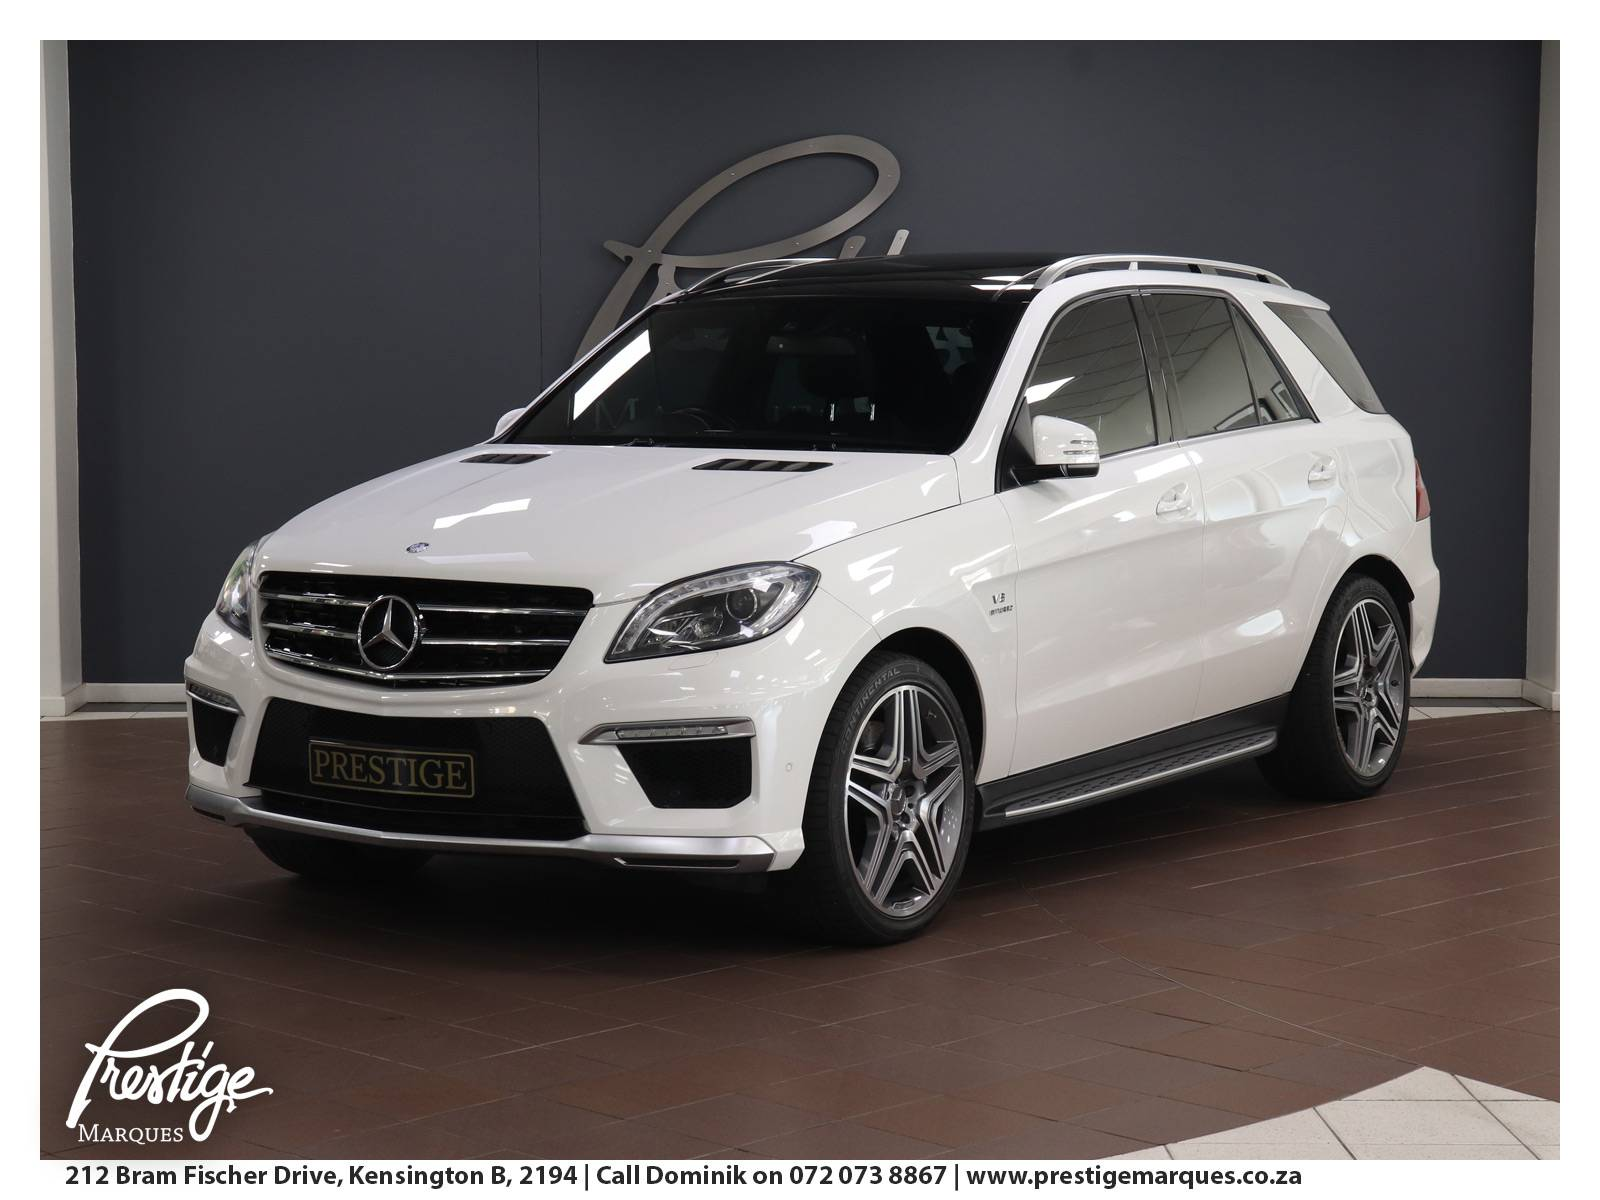 2015-Mercedes-Benz-ML63-AMG-Prestige-Marques-Randburg-Sandton-6